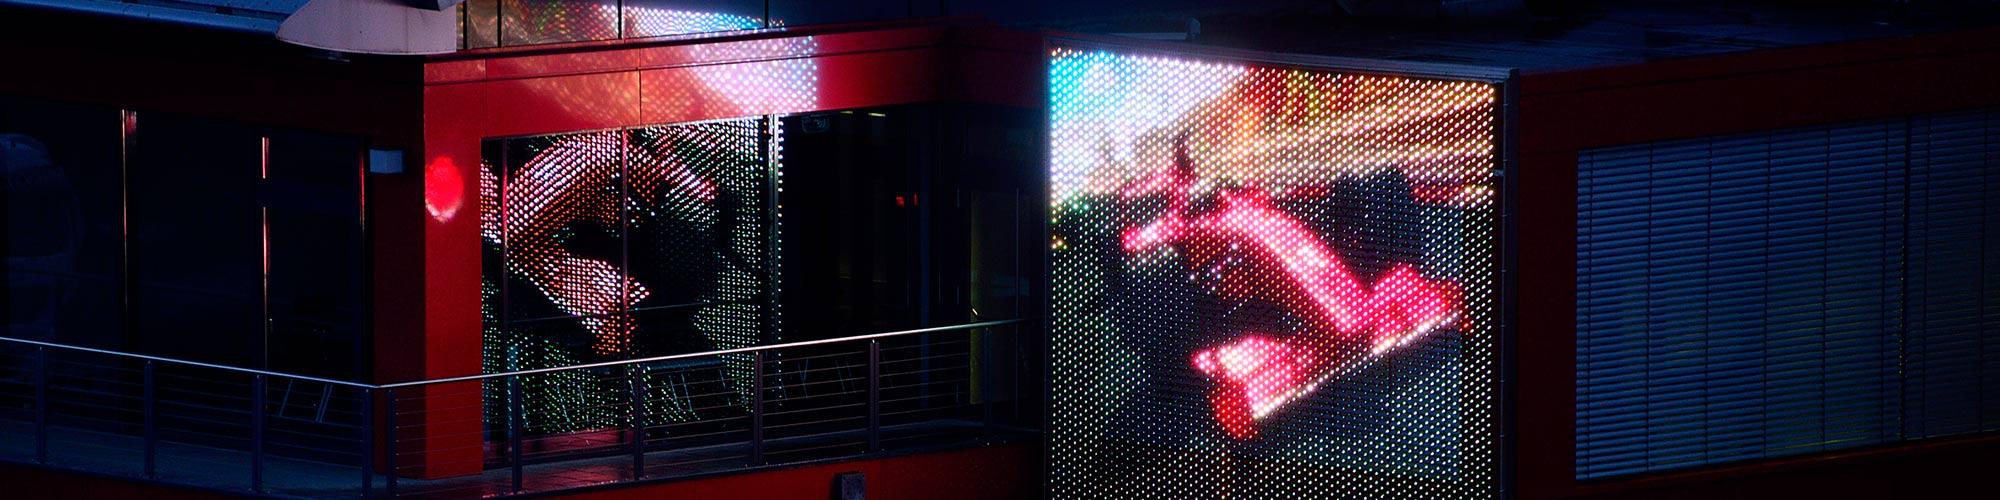 LED Module Medienfassade X-LED Carl Stahl Architektur